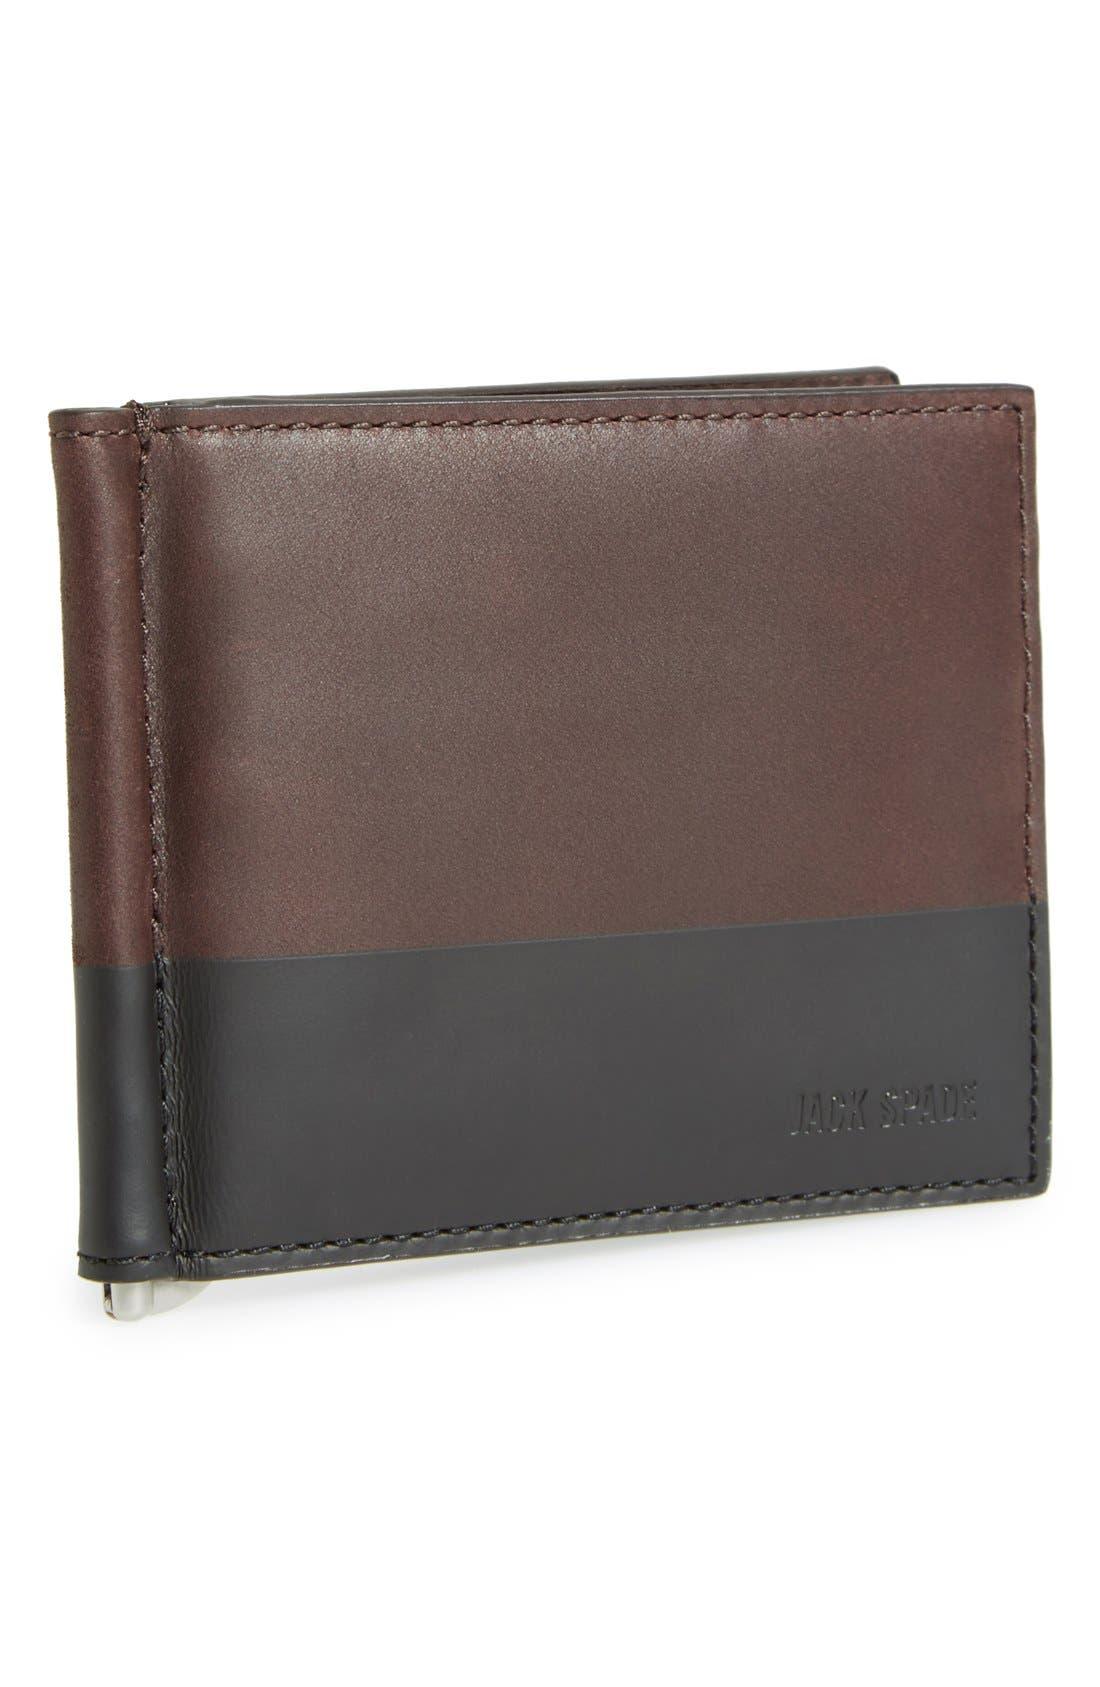 JACK SPADE Leather Money Clip Wallet, Main, color, 203